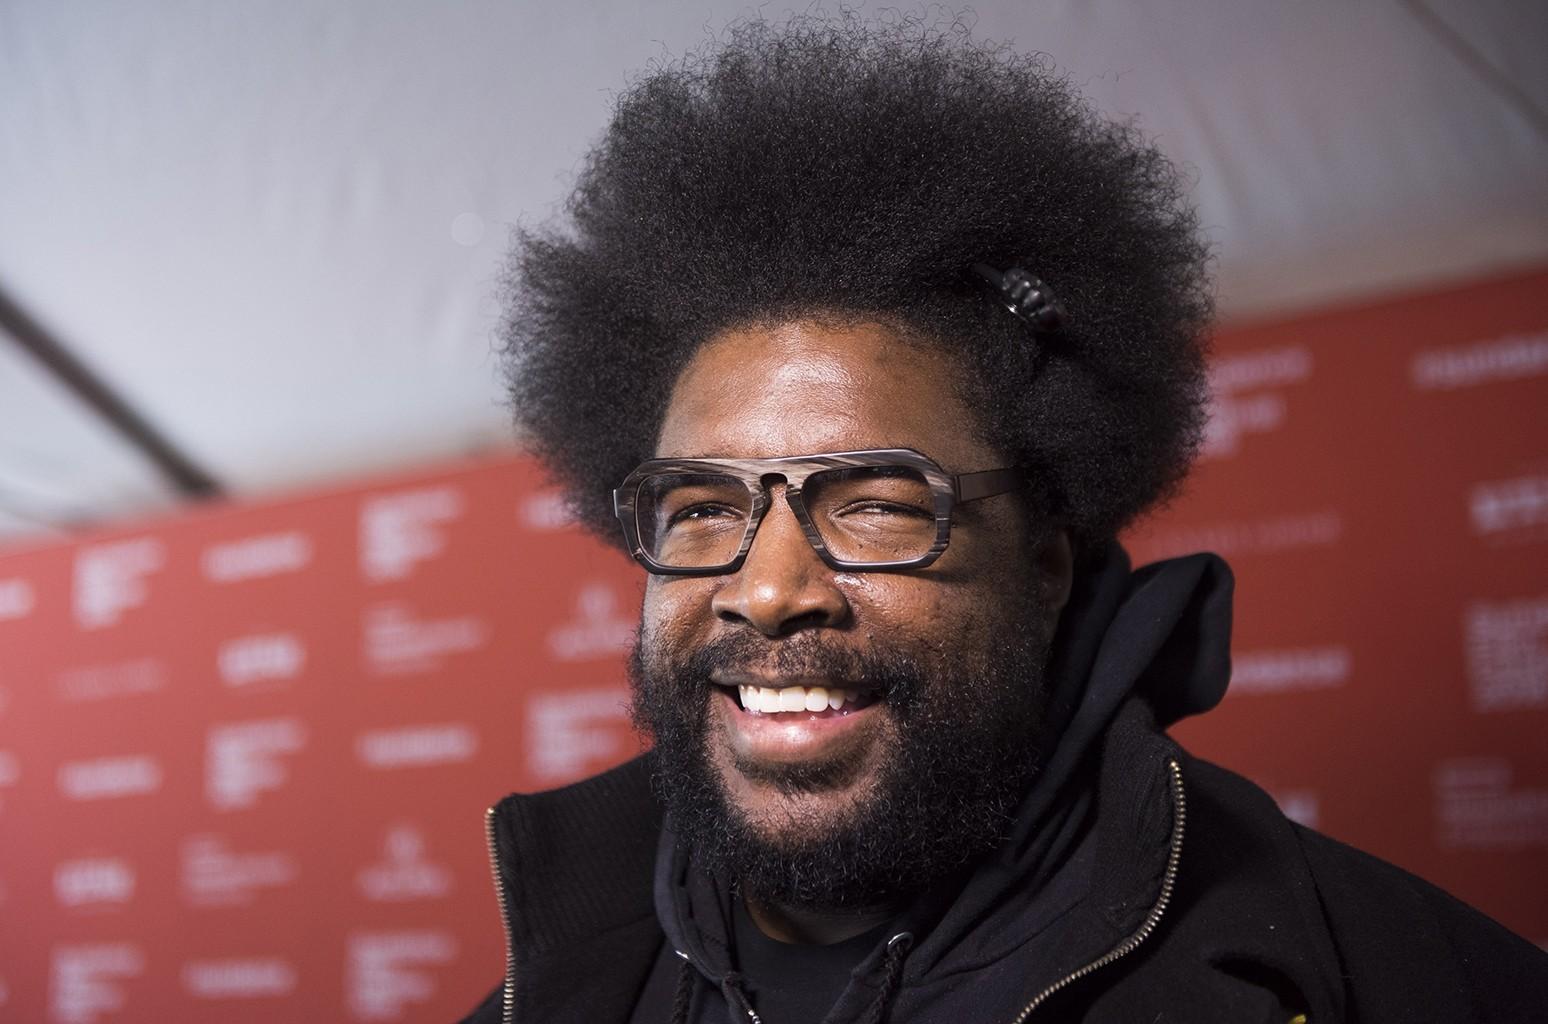 Questlove at the 2016 Sundance Film Festival